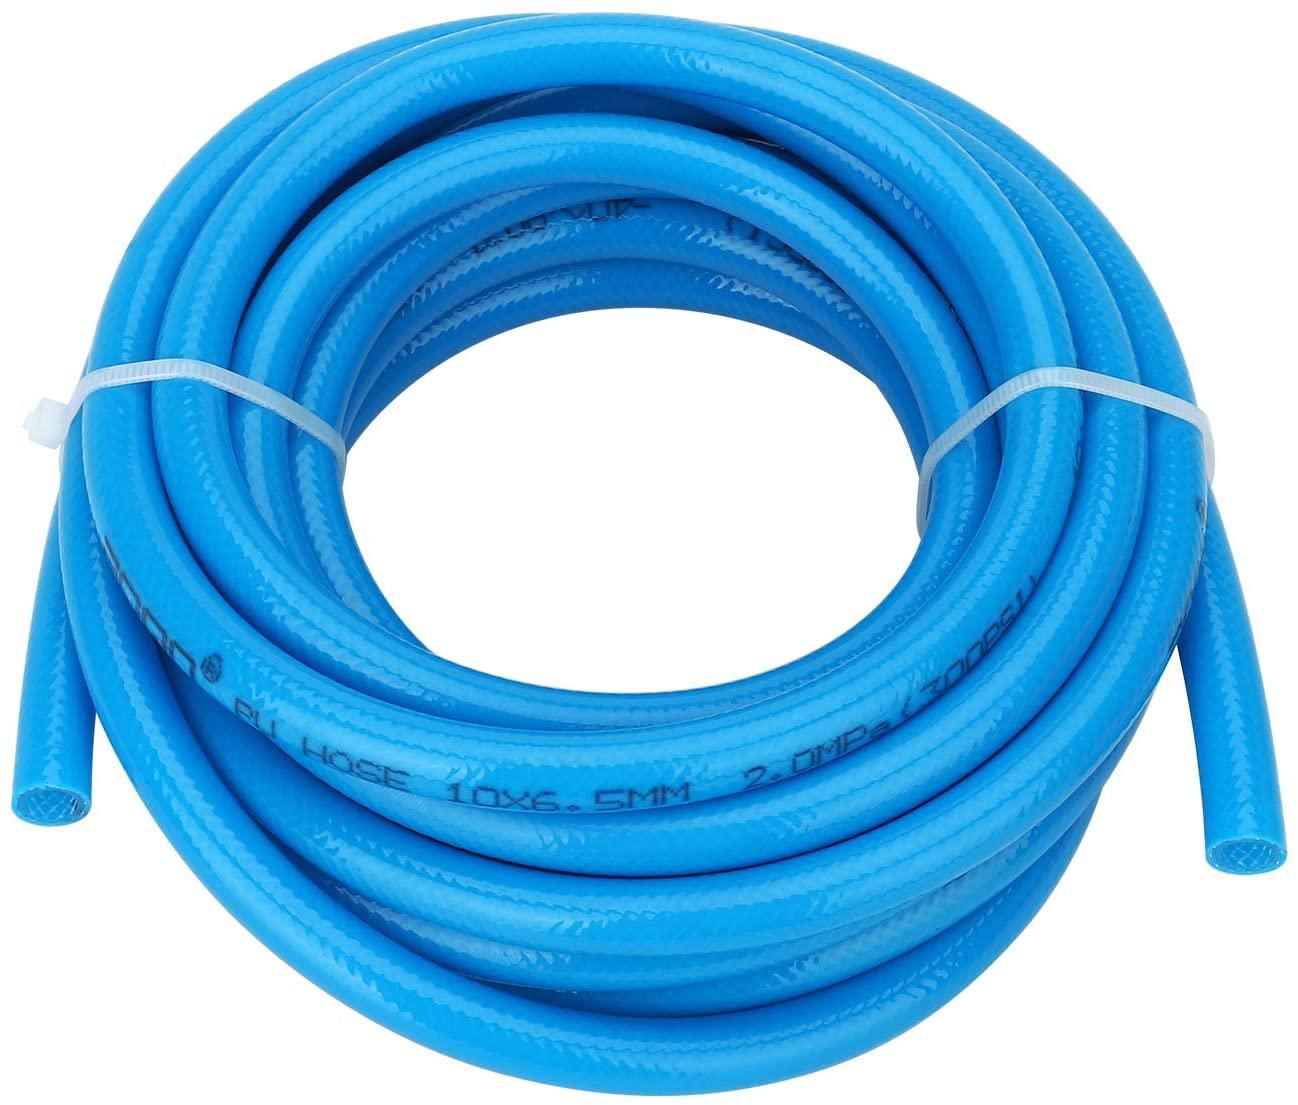 Surprecision PU Plastic Air Hose Tube (Extra Pressure) Length 5m(16.4ft) Dia 5mm/8mm Resist High-Temperature Abrasion